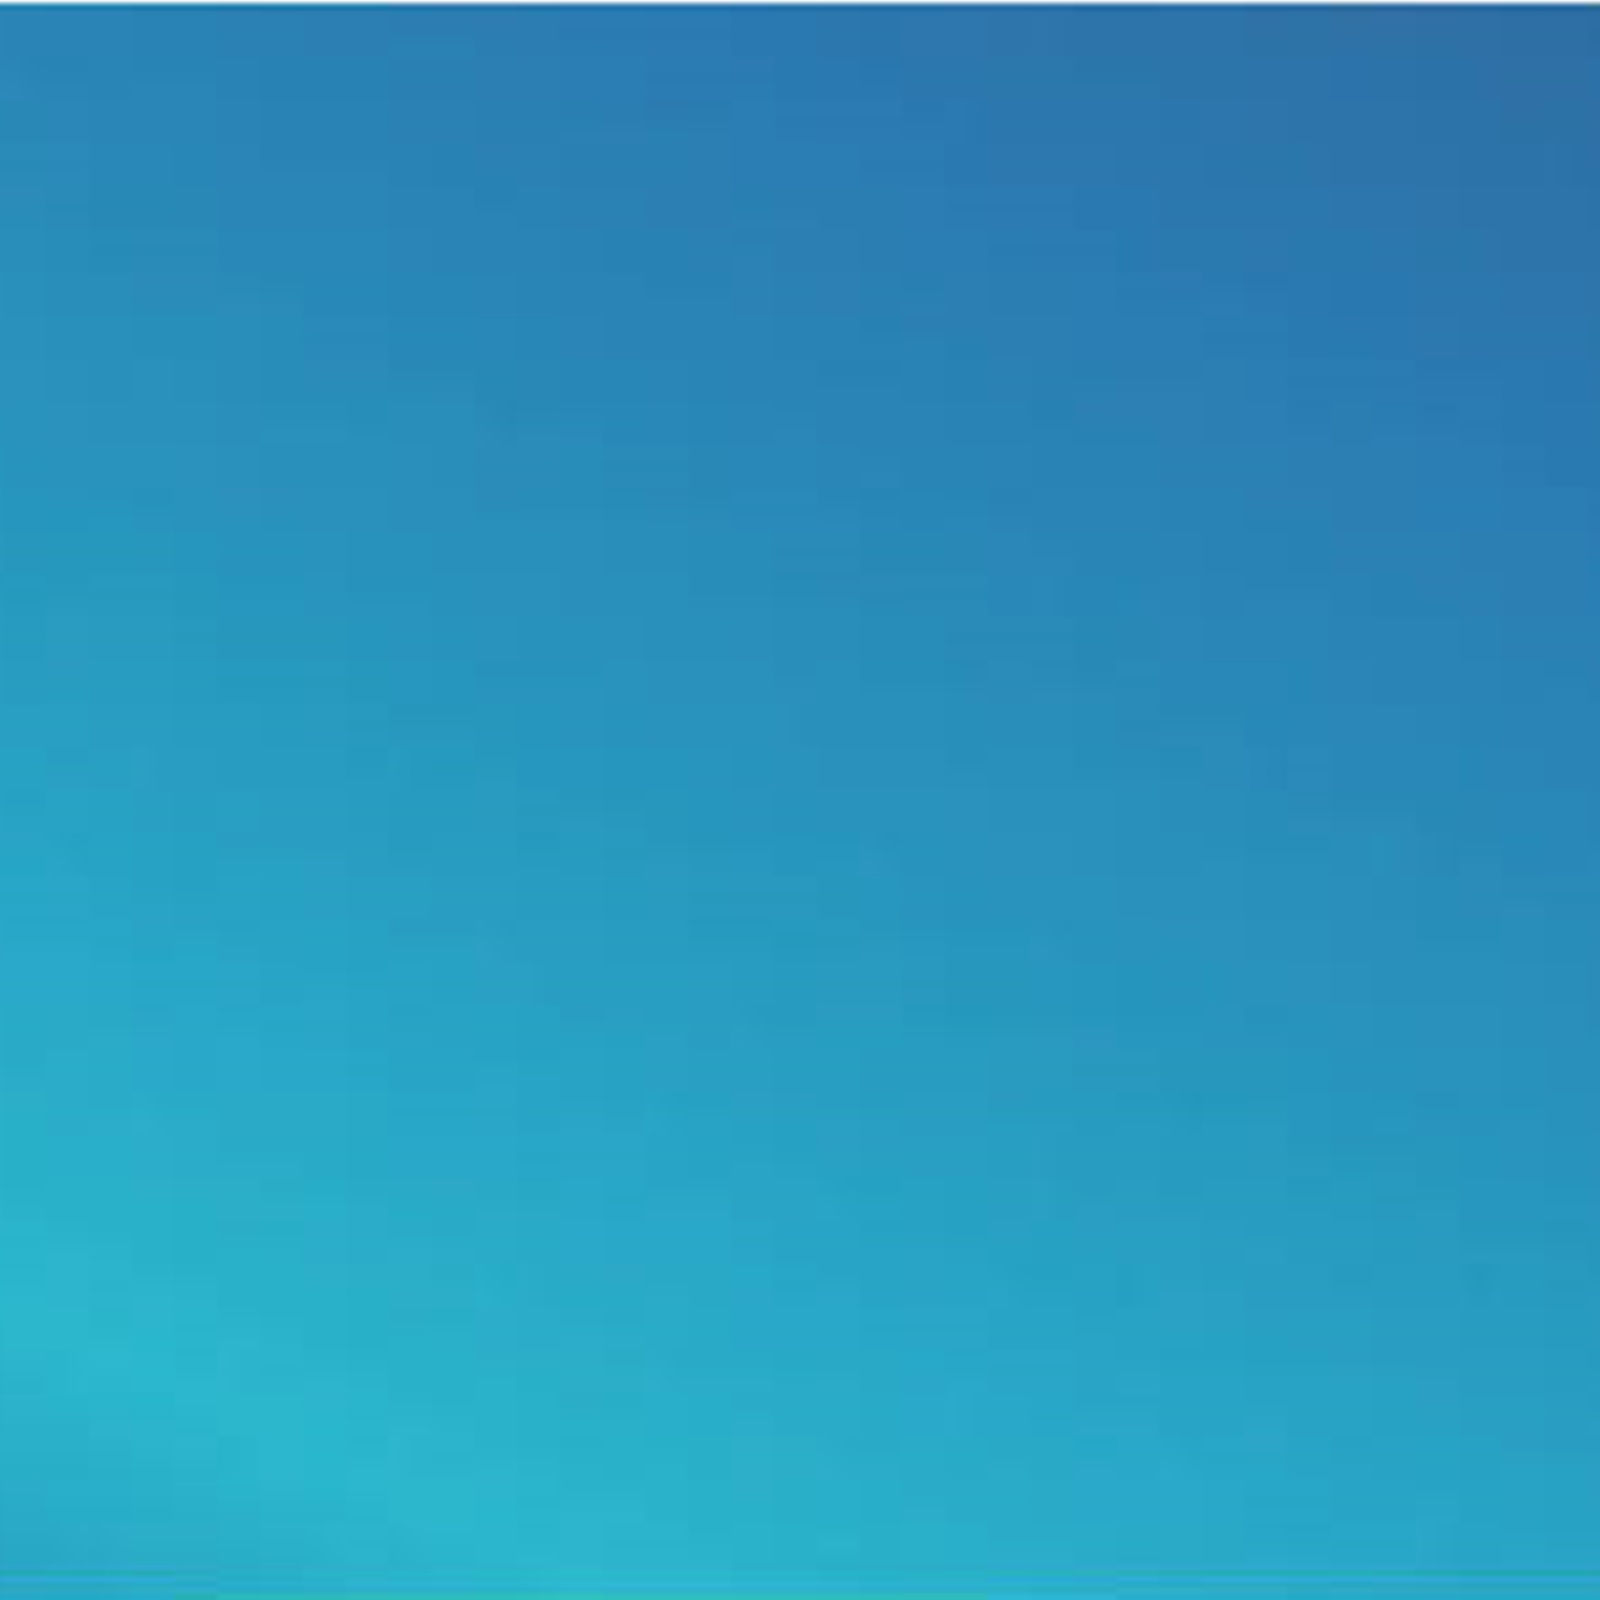 albastru deschis metalizat creamy